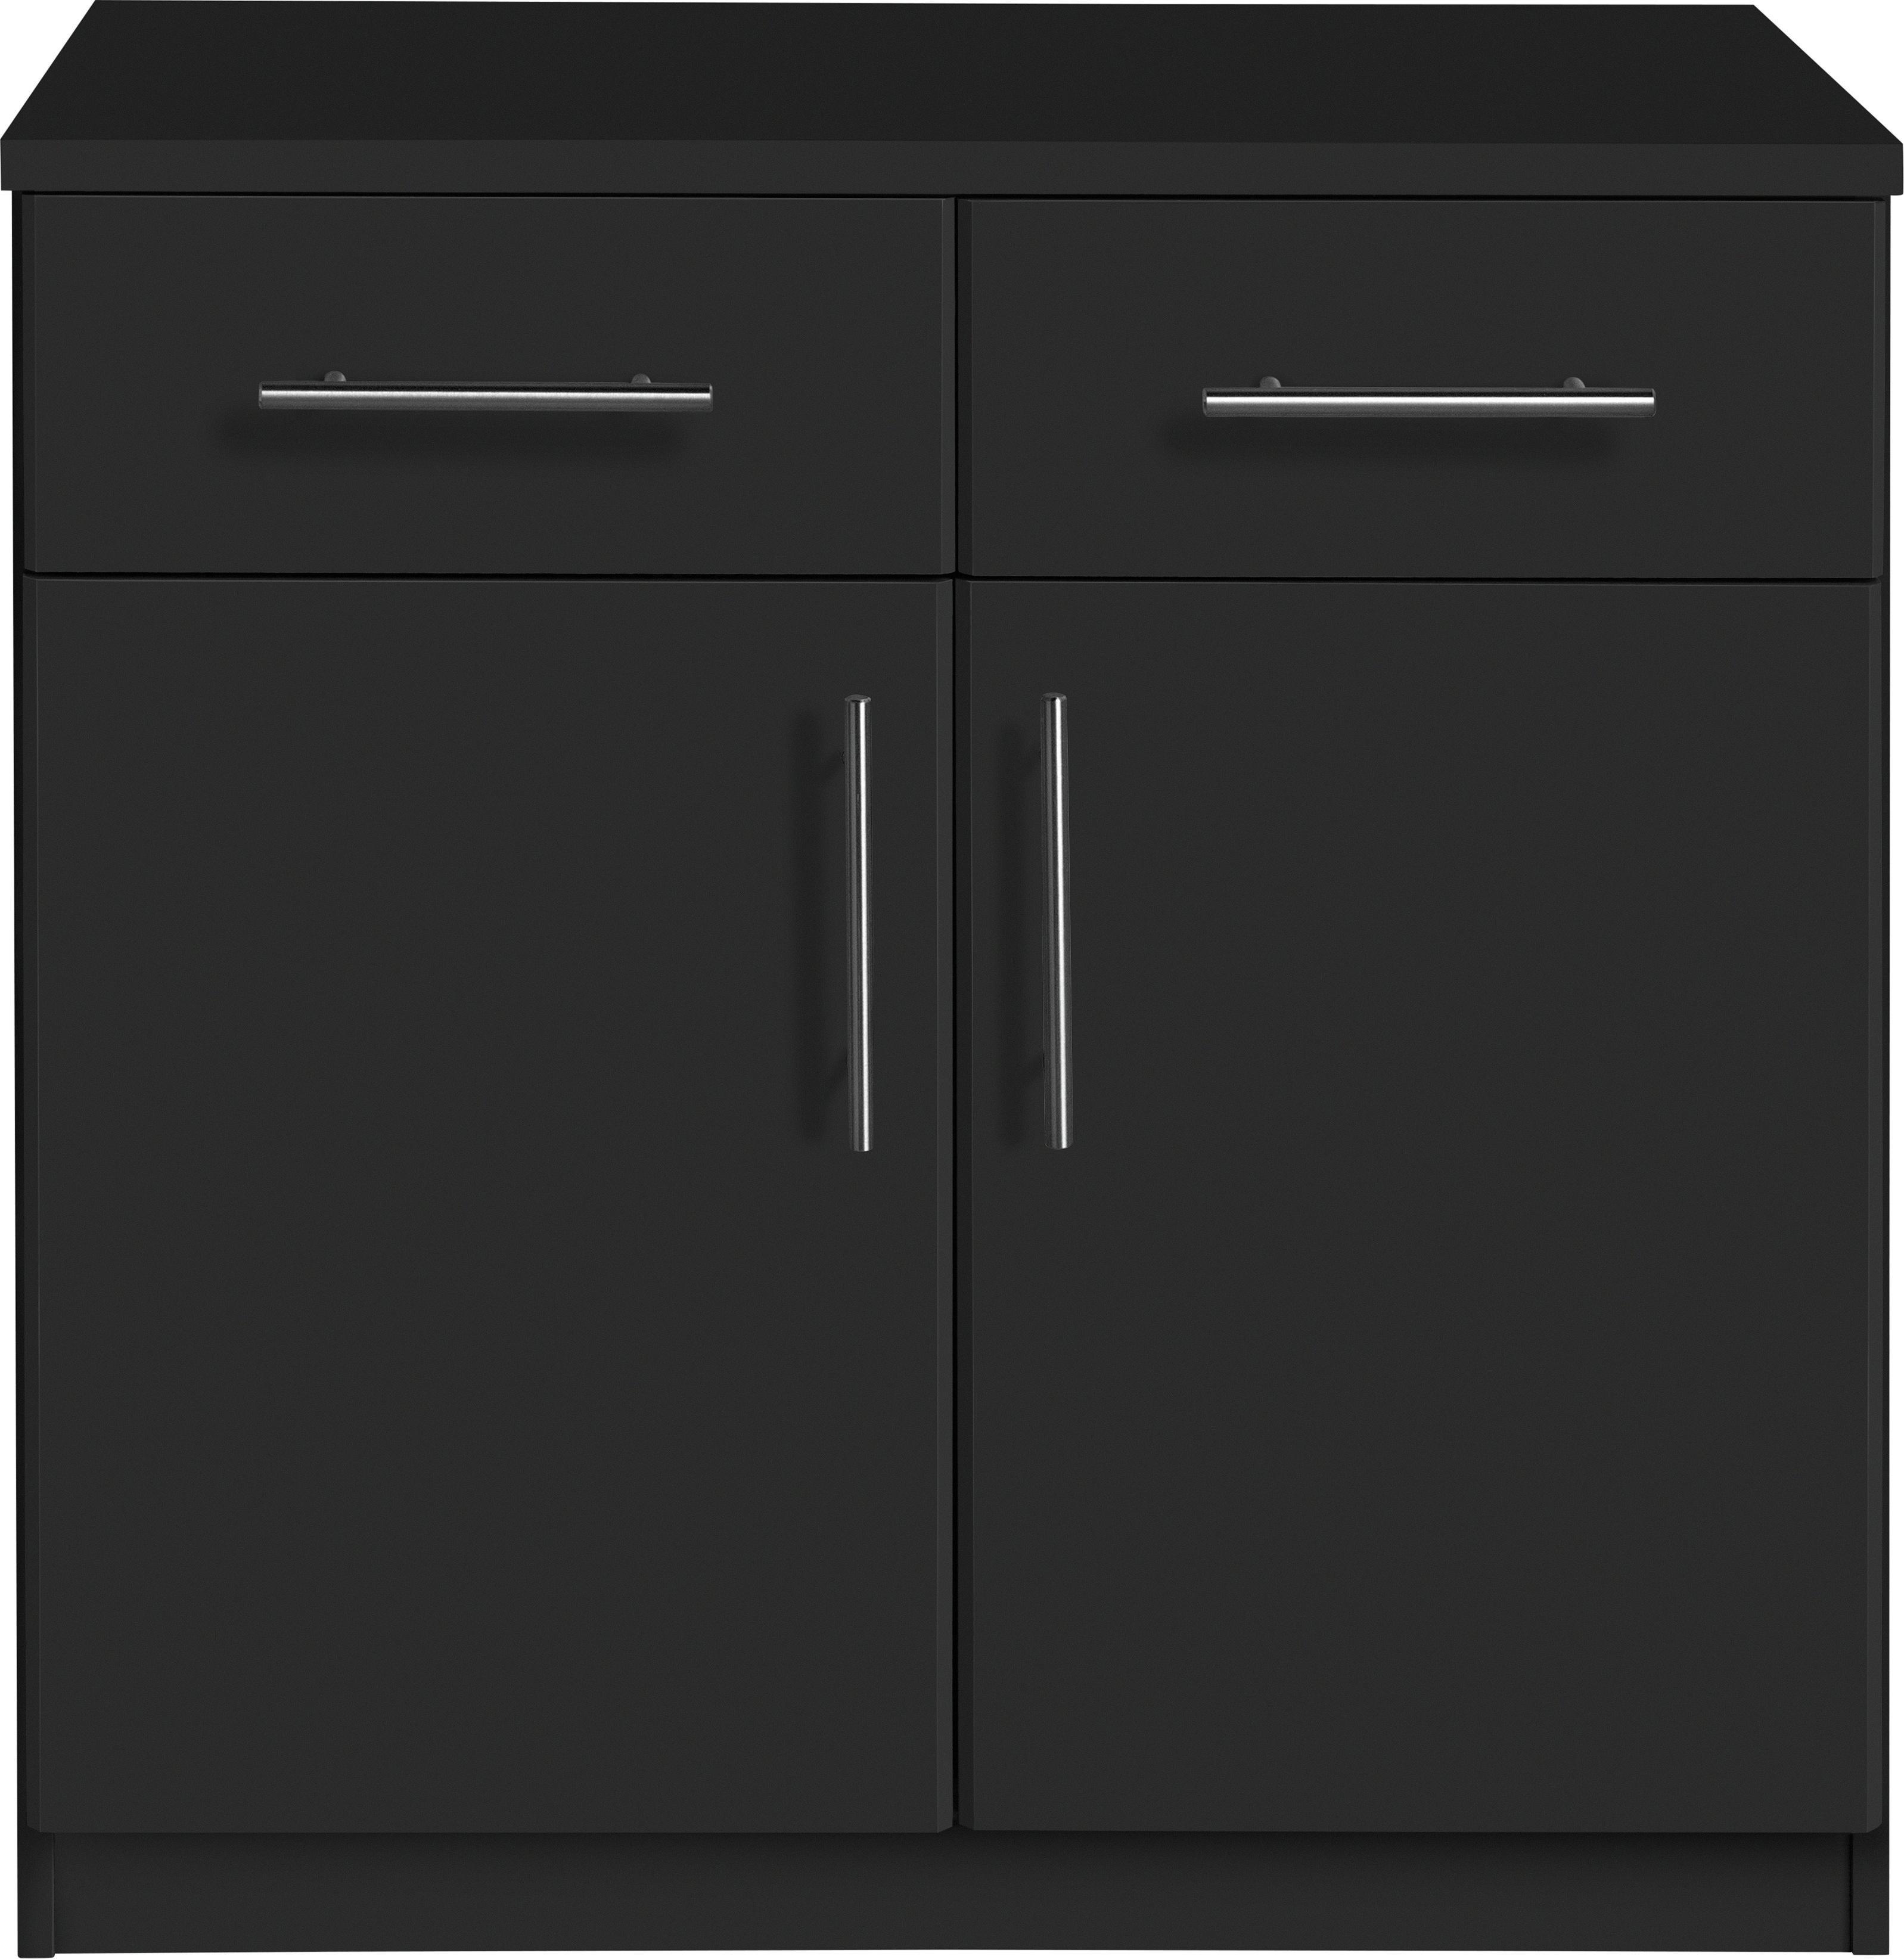 Argos Home Anderson 2 Door 2 Drawer Sideboard - Black